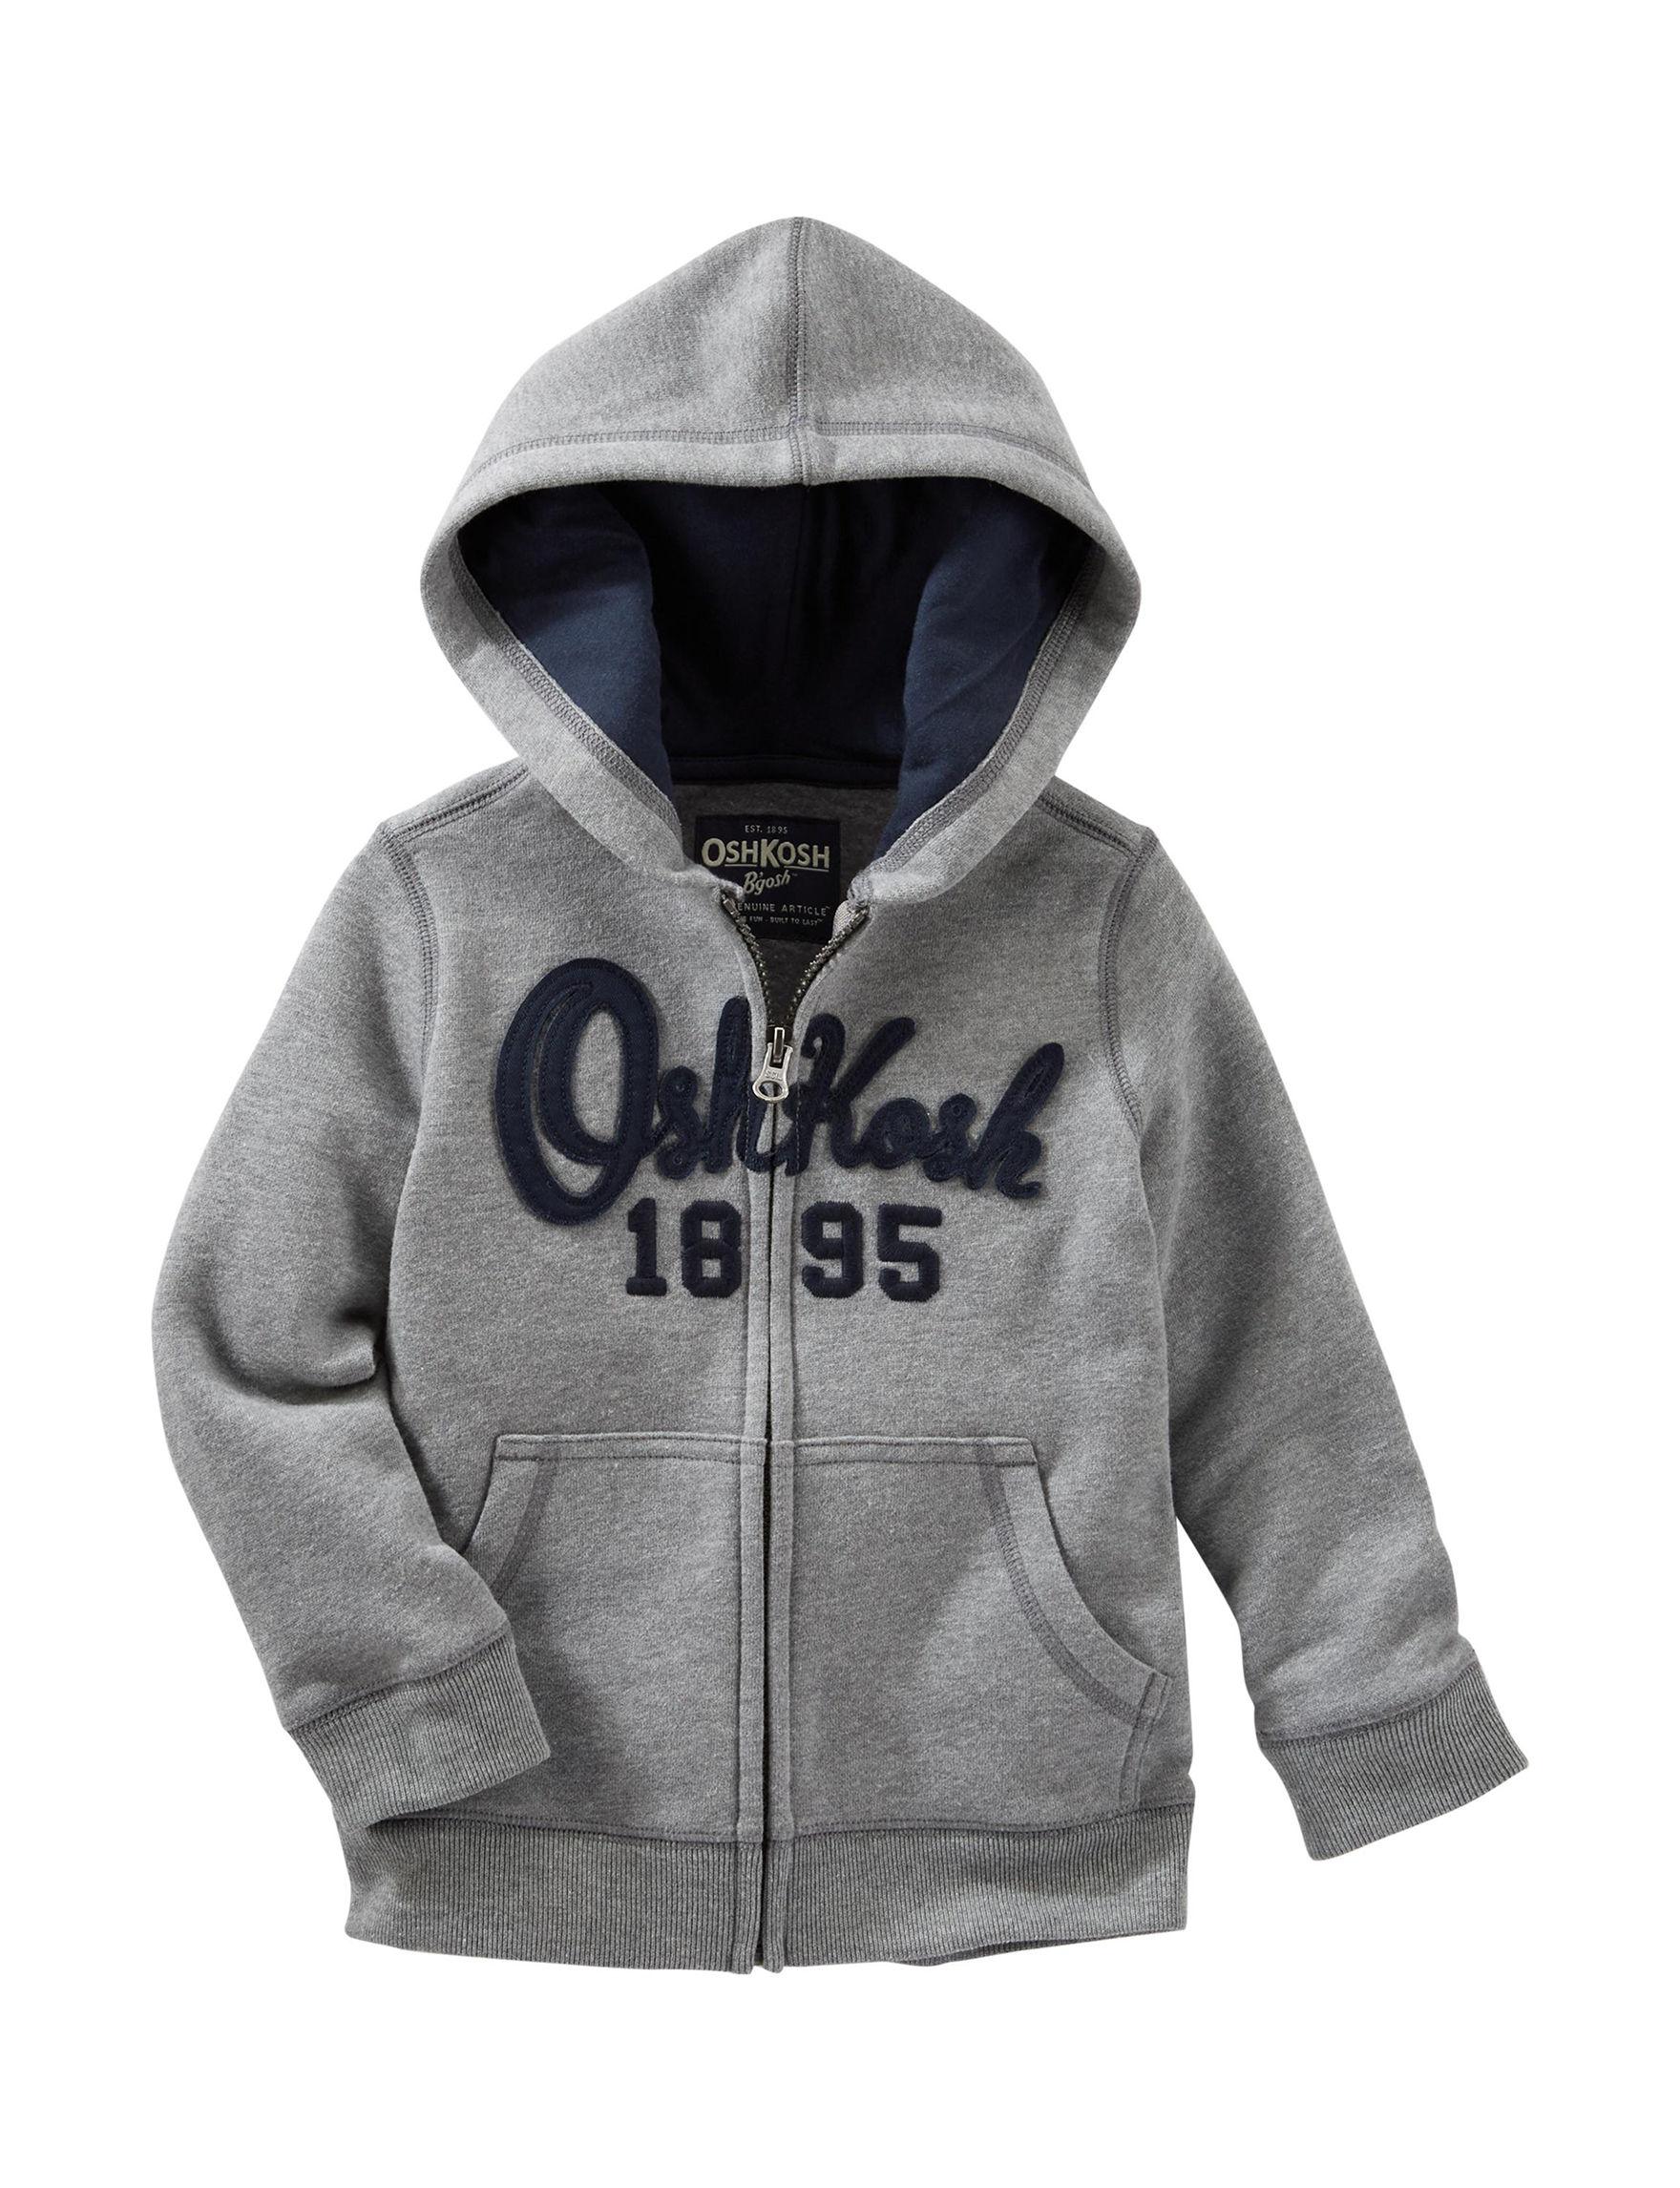 Oshkosh B'Gosh Grey Lightweight Jackets & Blazers